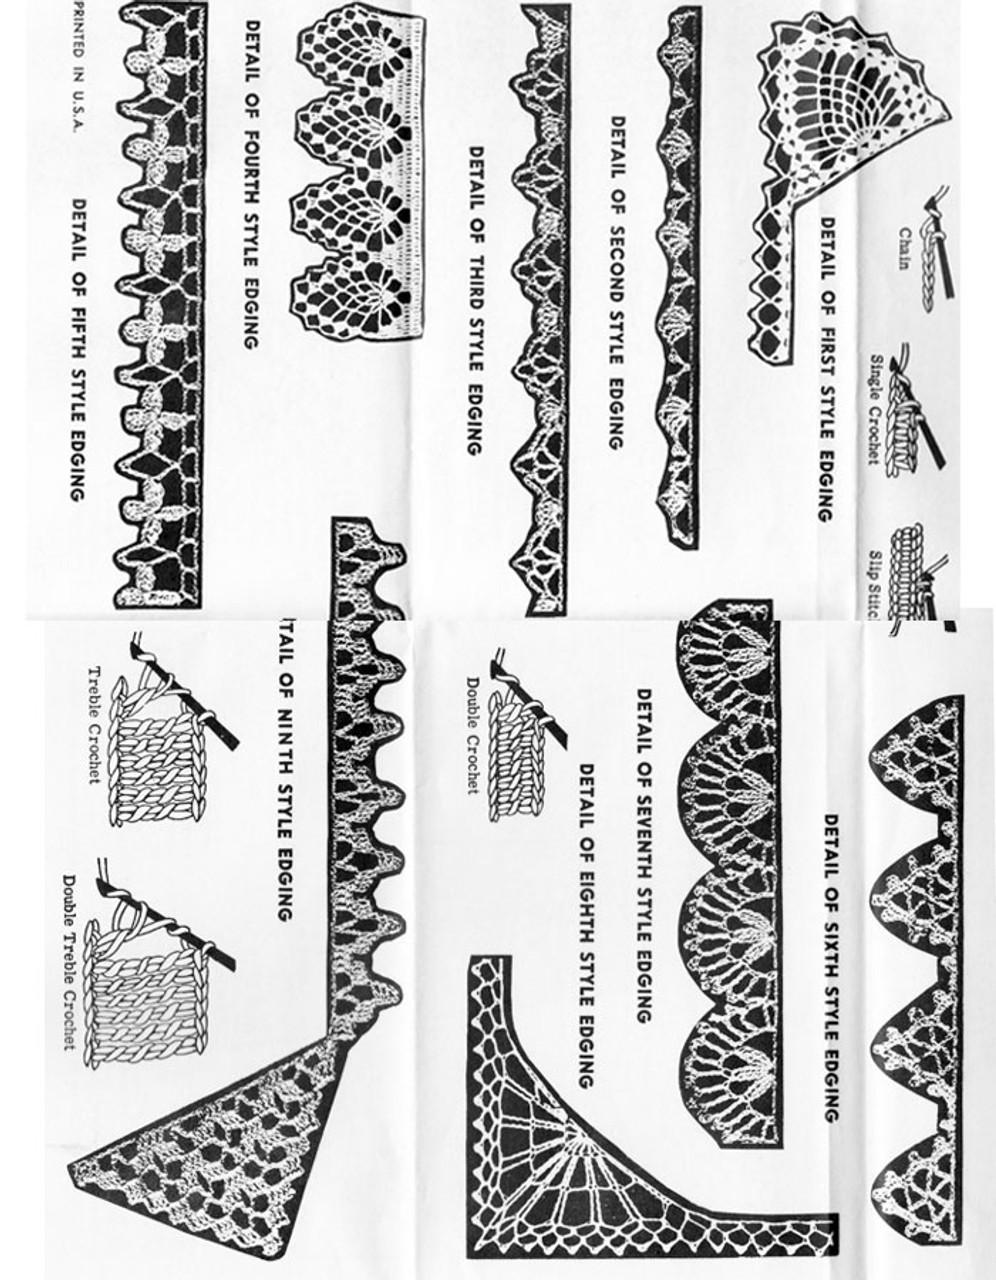 Crochet Corners Edgings Pattern, Alice Brooks 7310